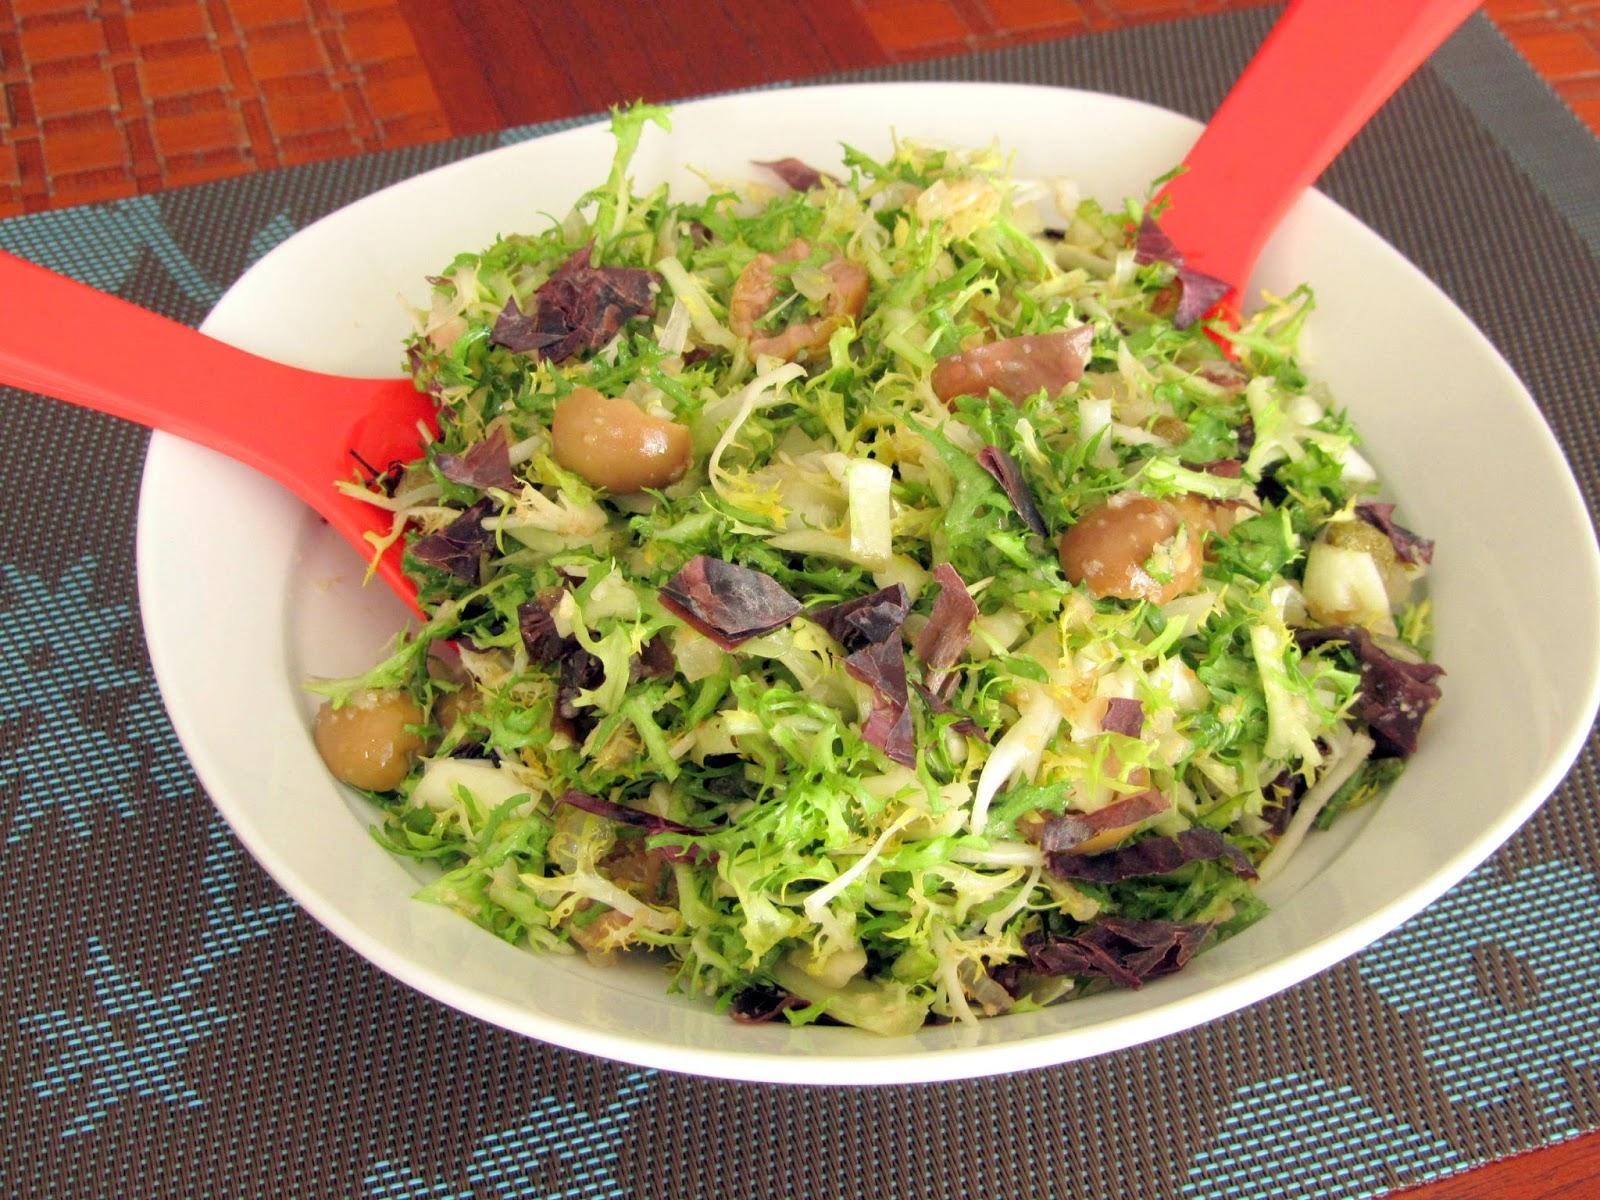 ensaladas verdes sencillas - photo #20